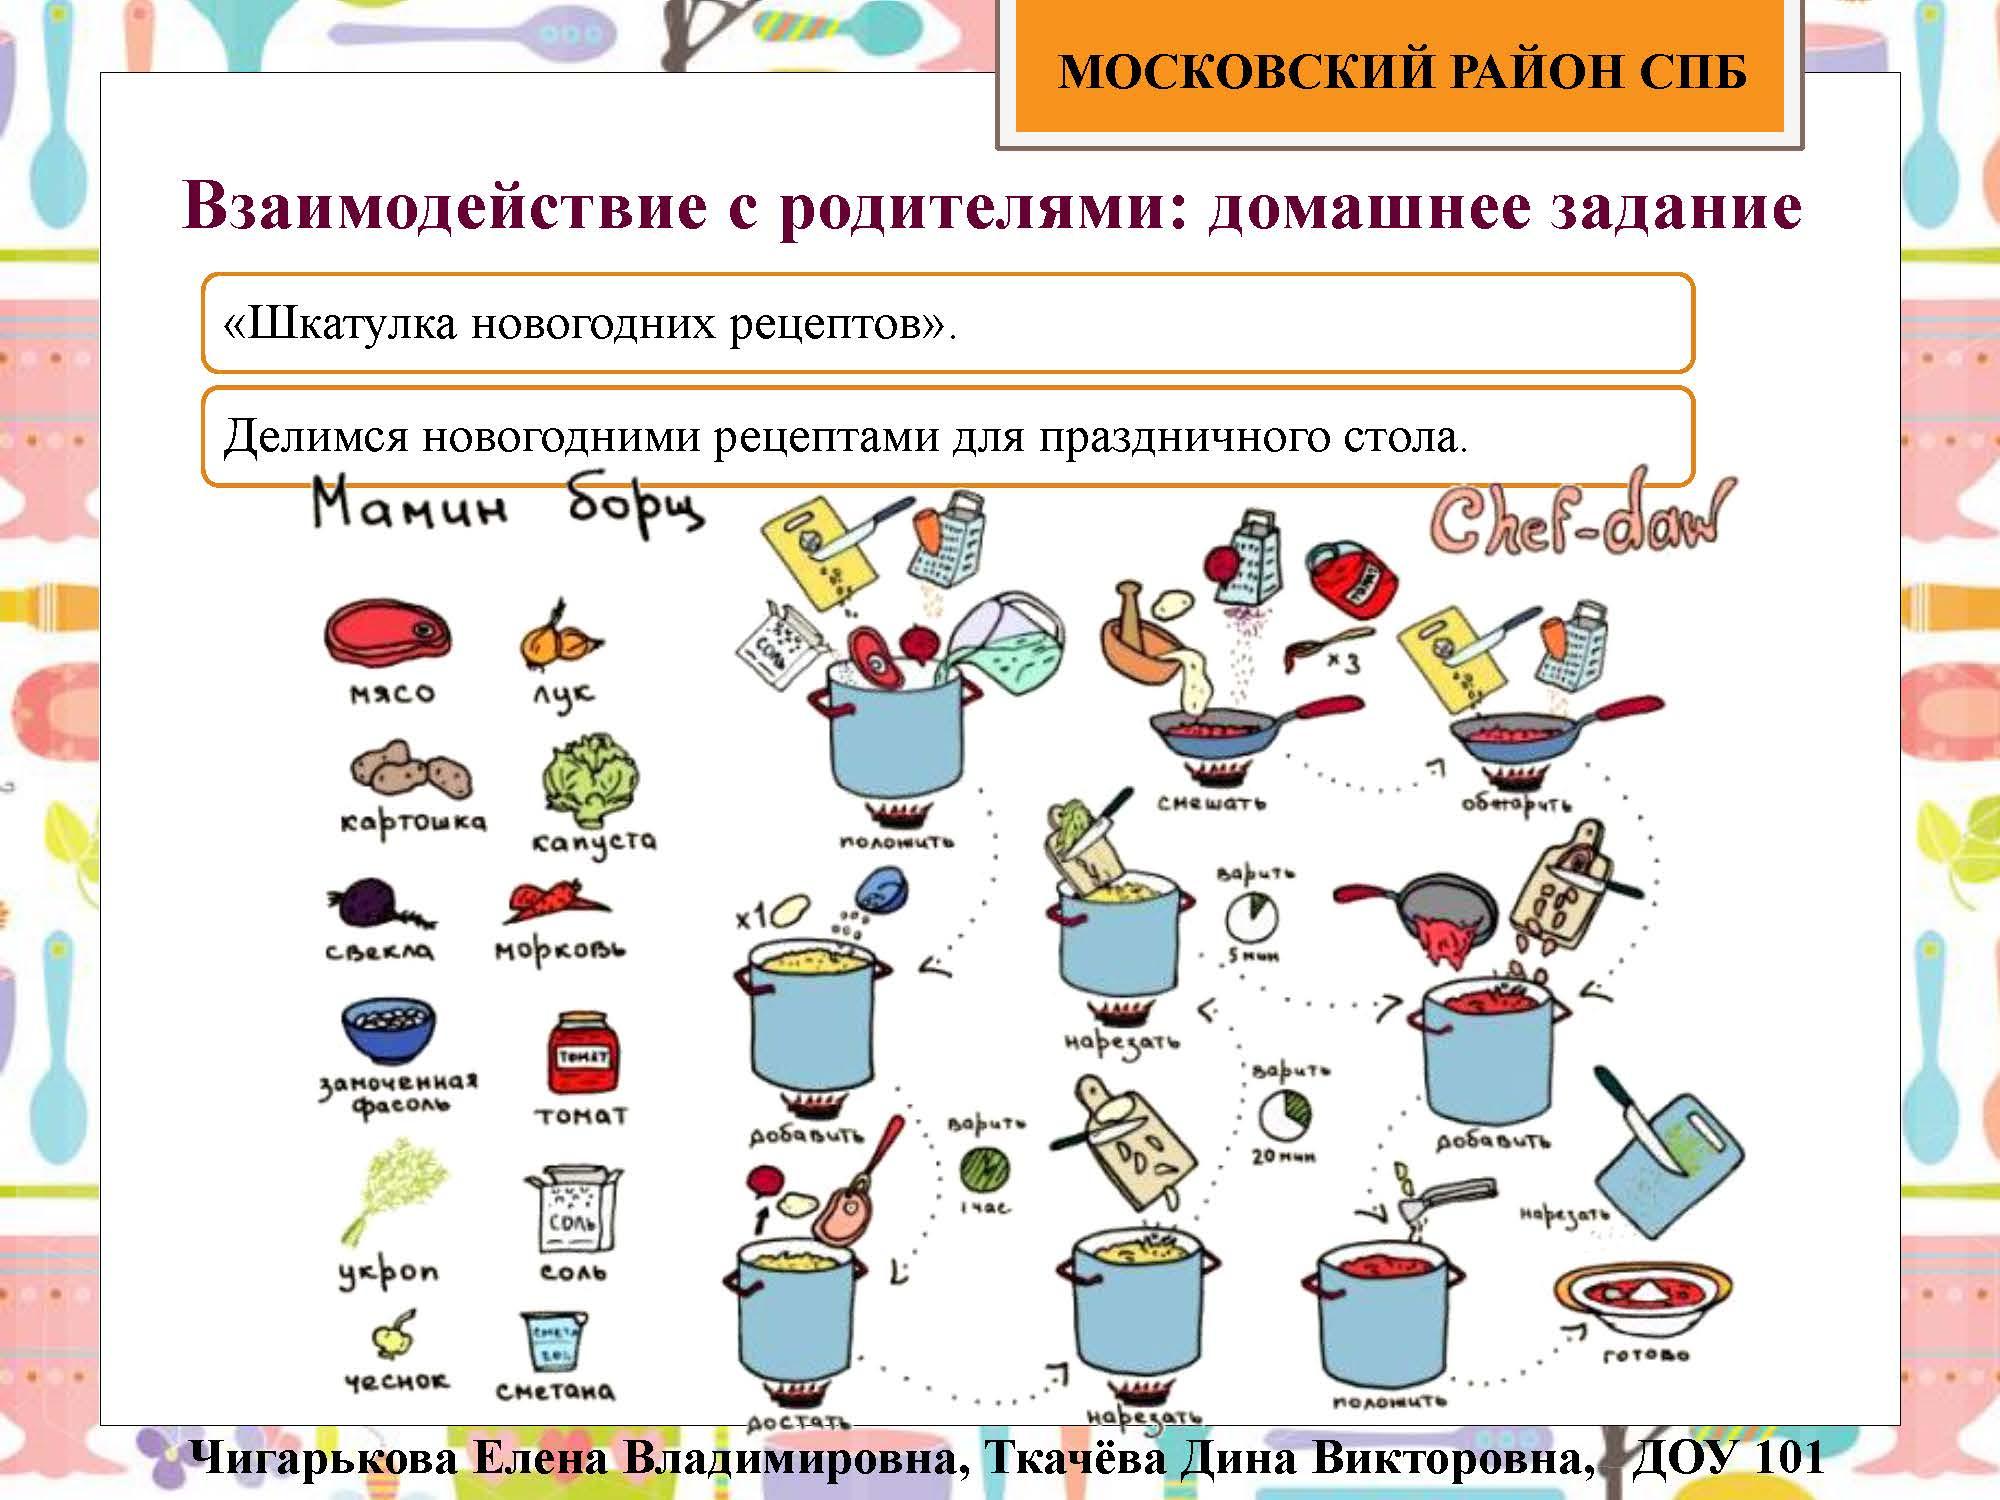 Секция 8. ДОУ 101, ПСИ. Московский район_Страница_11